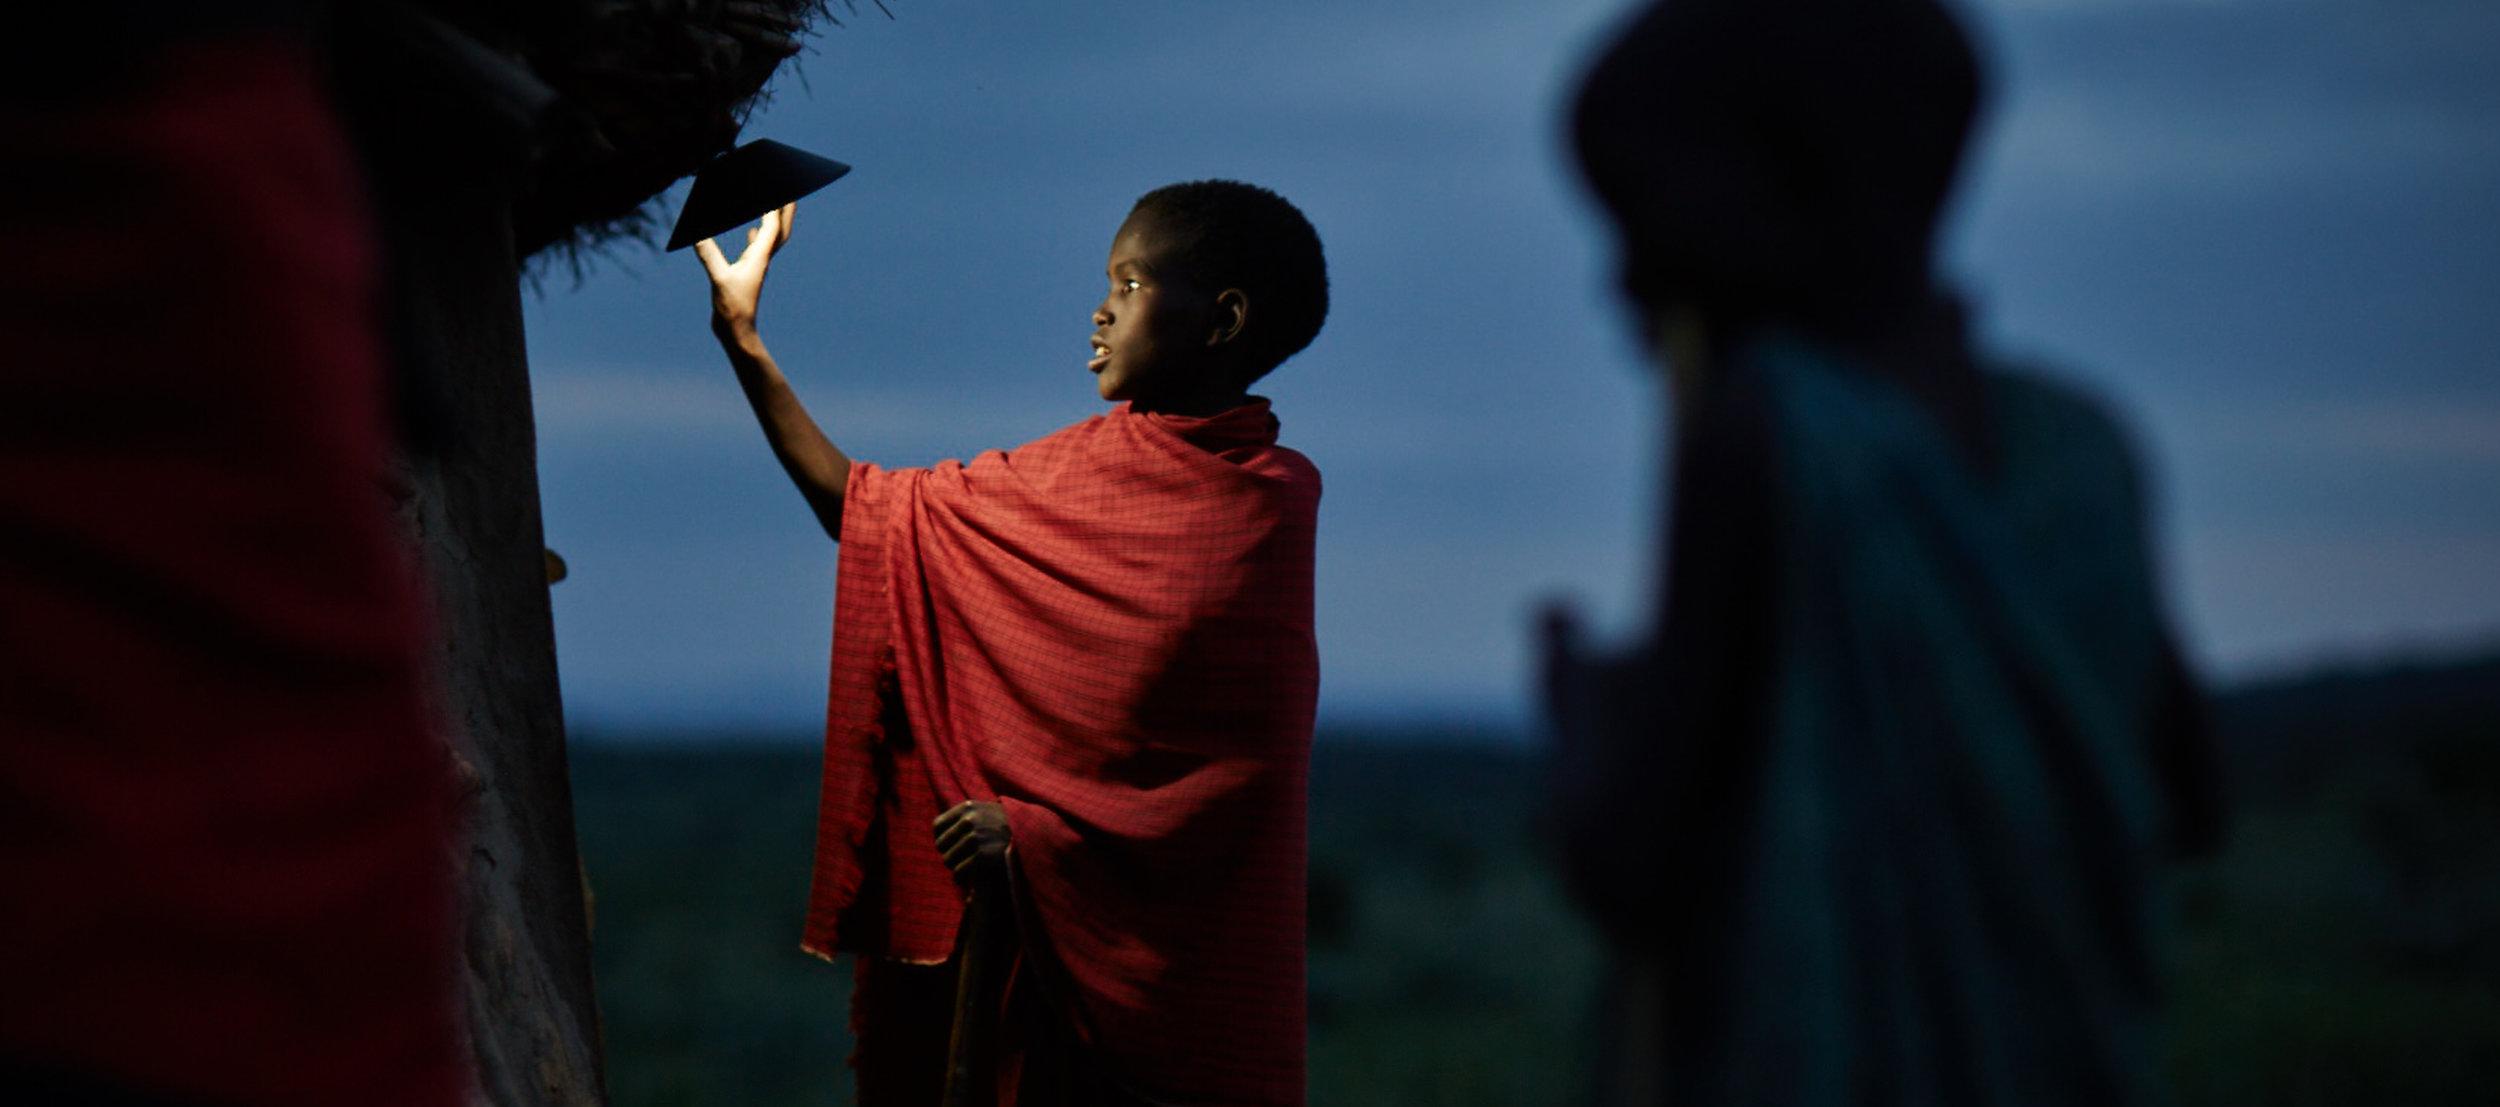 Zola electric boy lightbulb